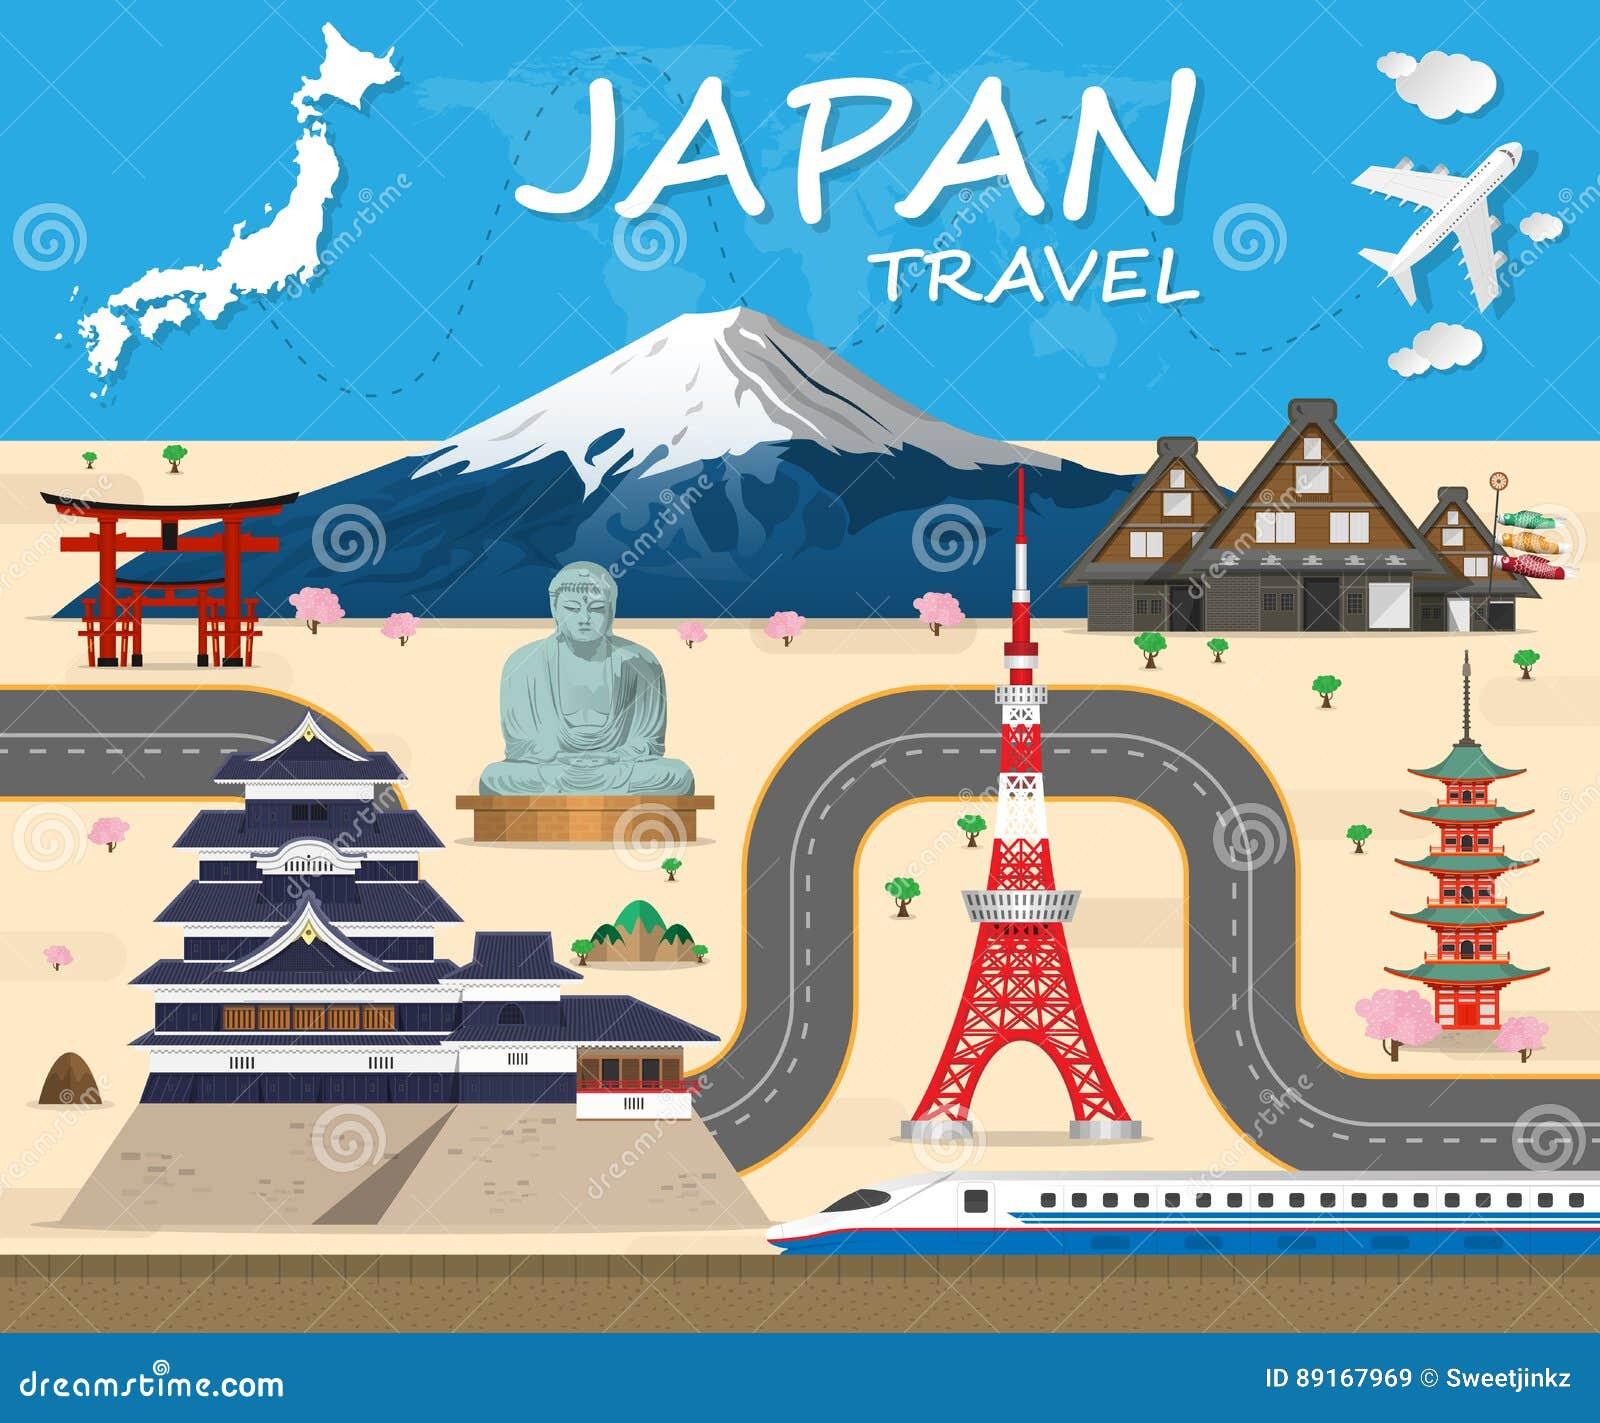 japan travel brochure template - japan travel background landmark global travel and journey